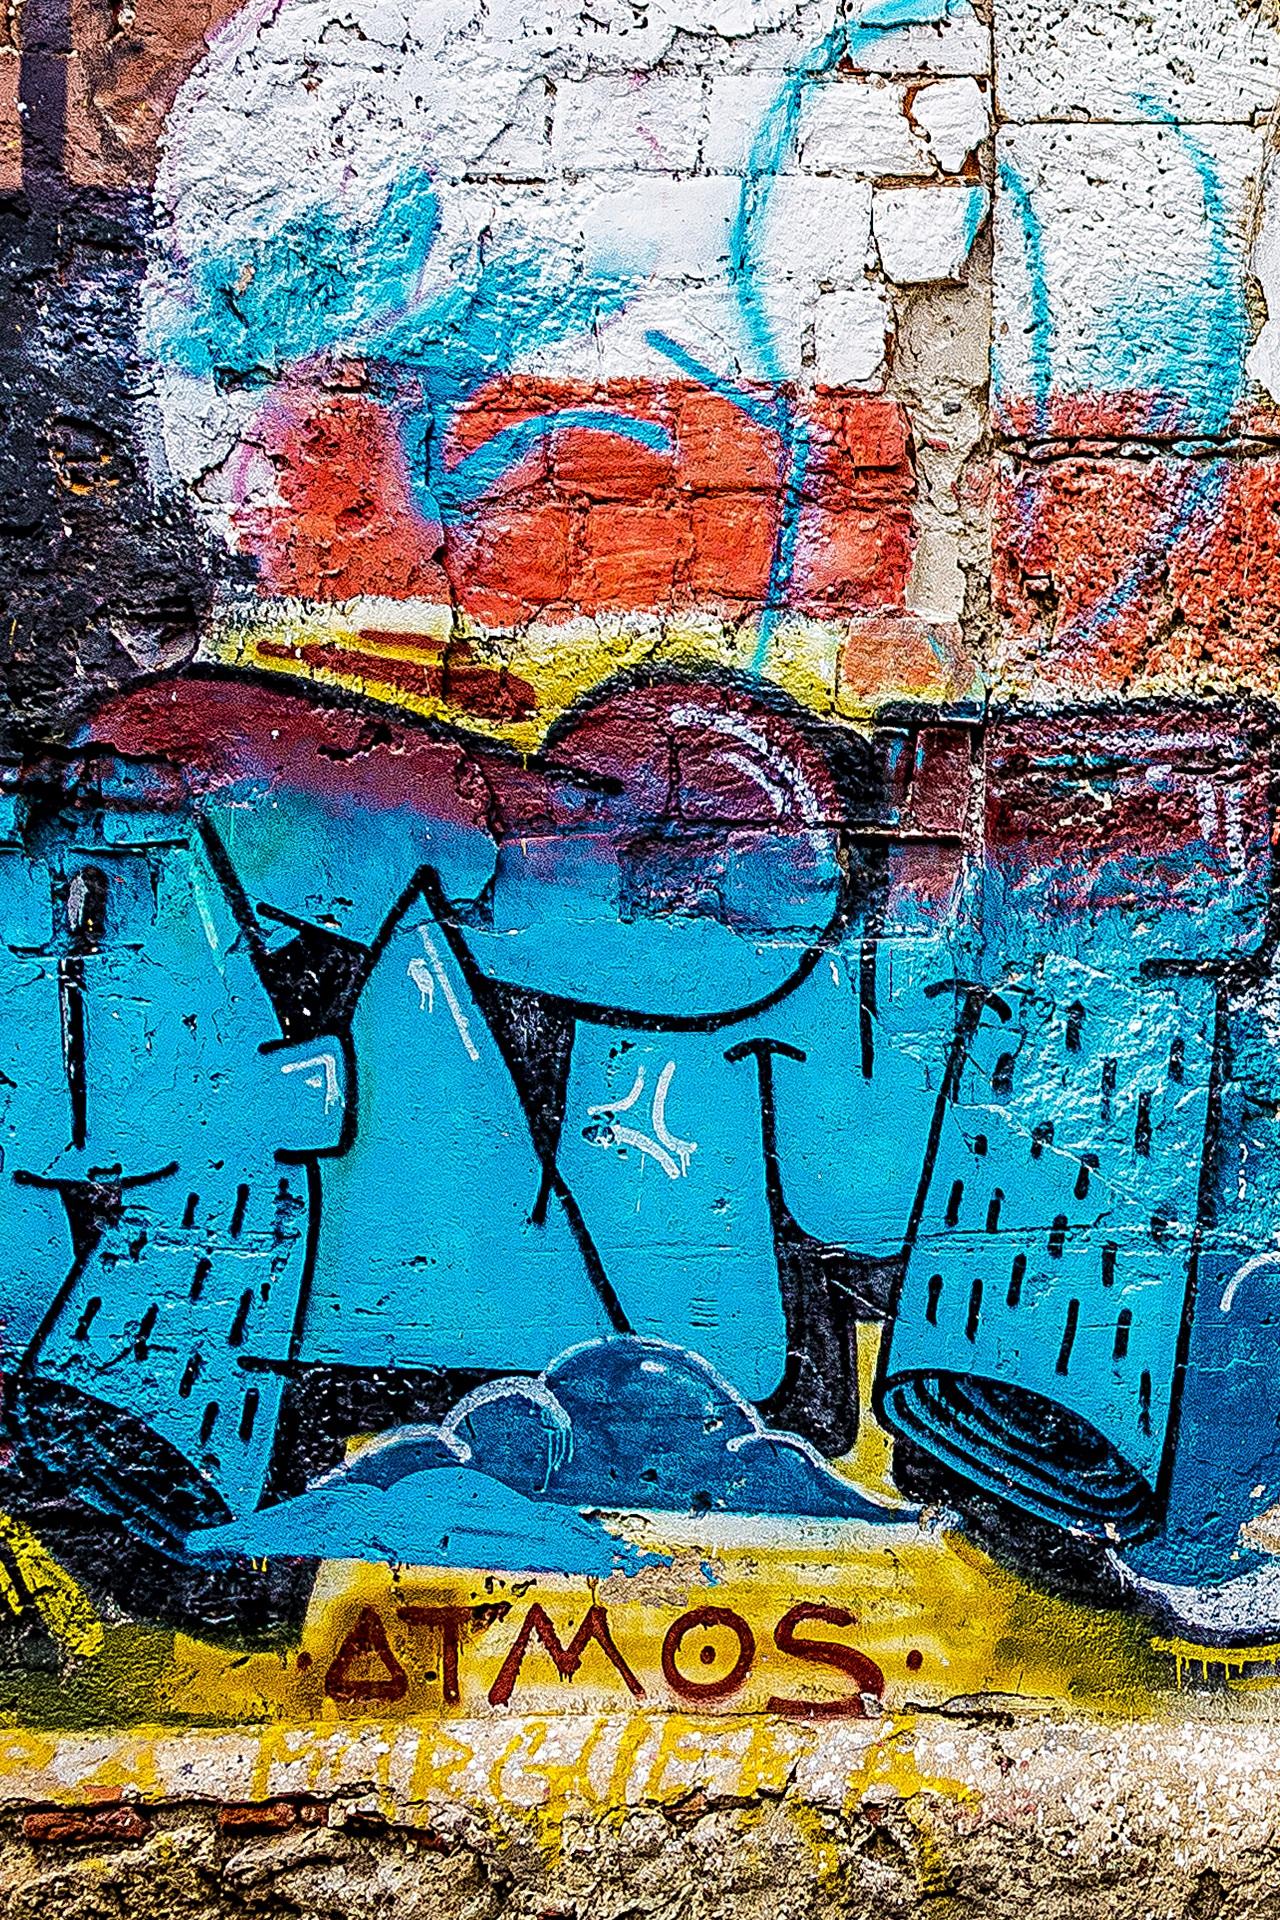 Abstract city urban artistic grunge colorful graffiti painting street art art background illustration mural spray paint